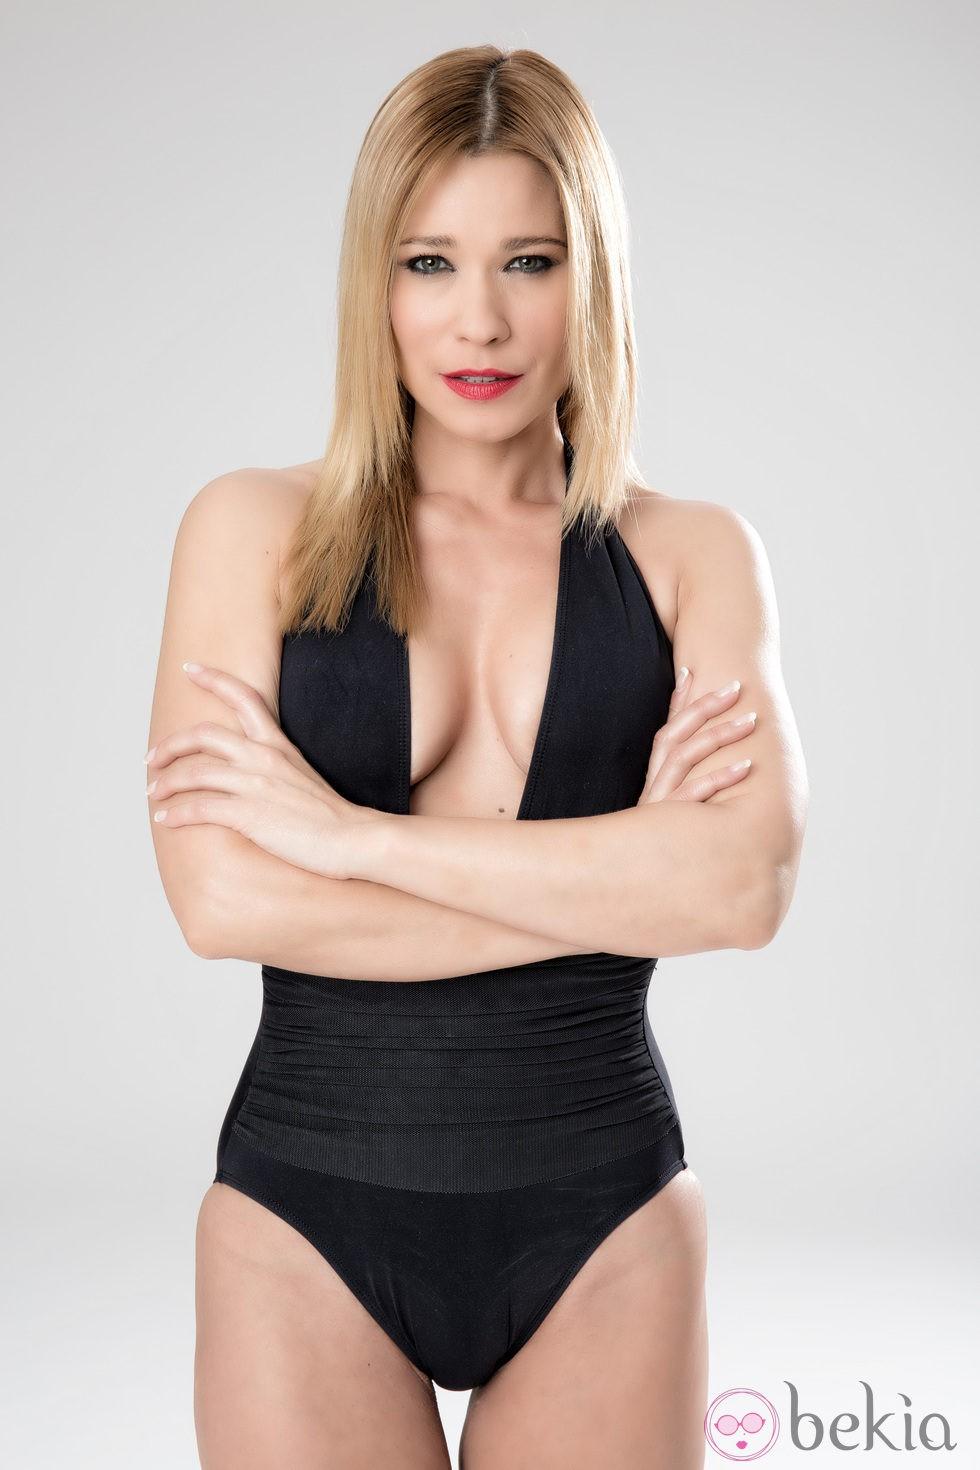 Celebrites Carla Hidalgo naked (23 photos), Topless, Cleavage, Selfie, lingerie 2015